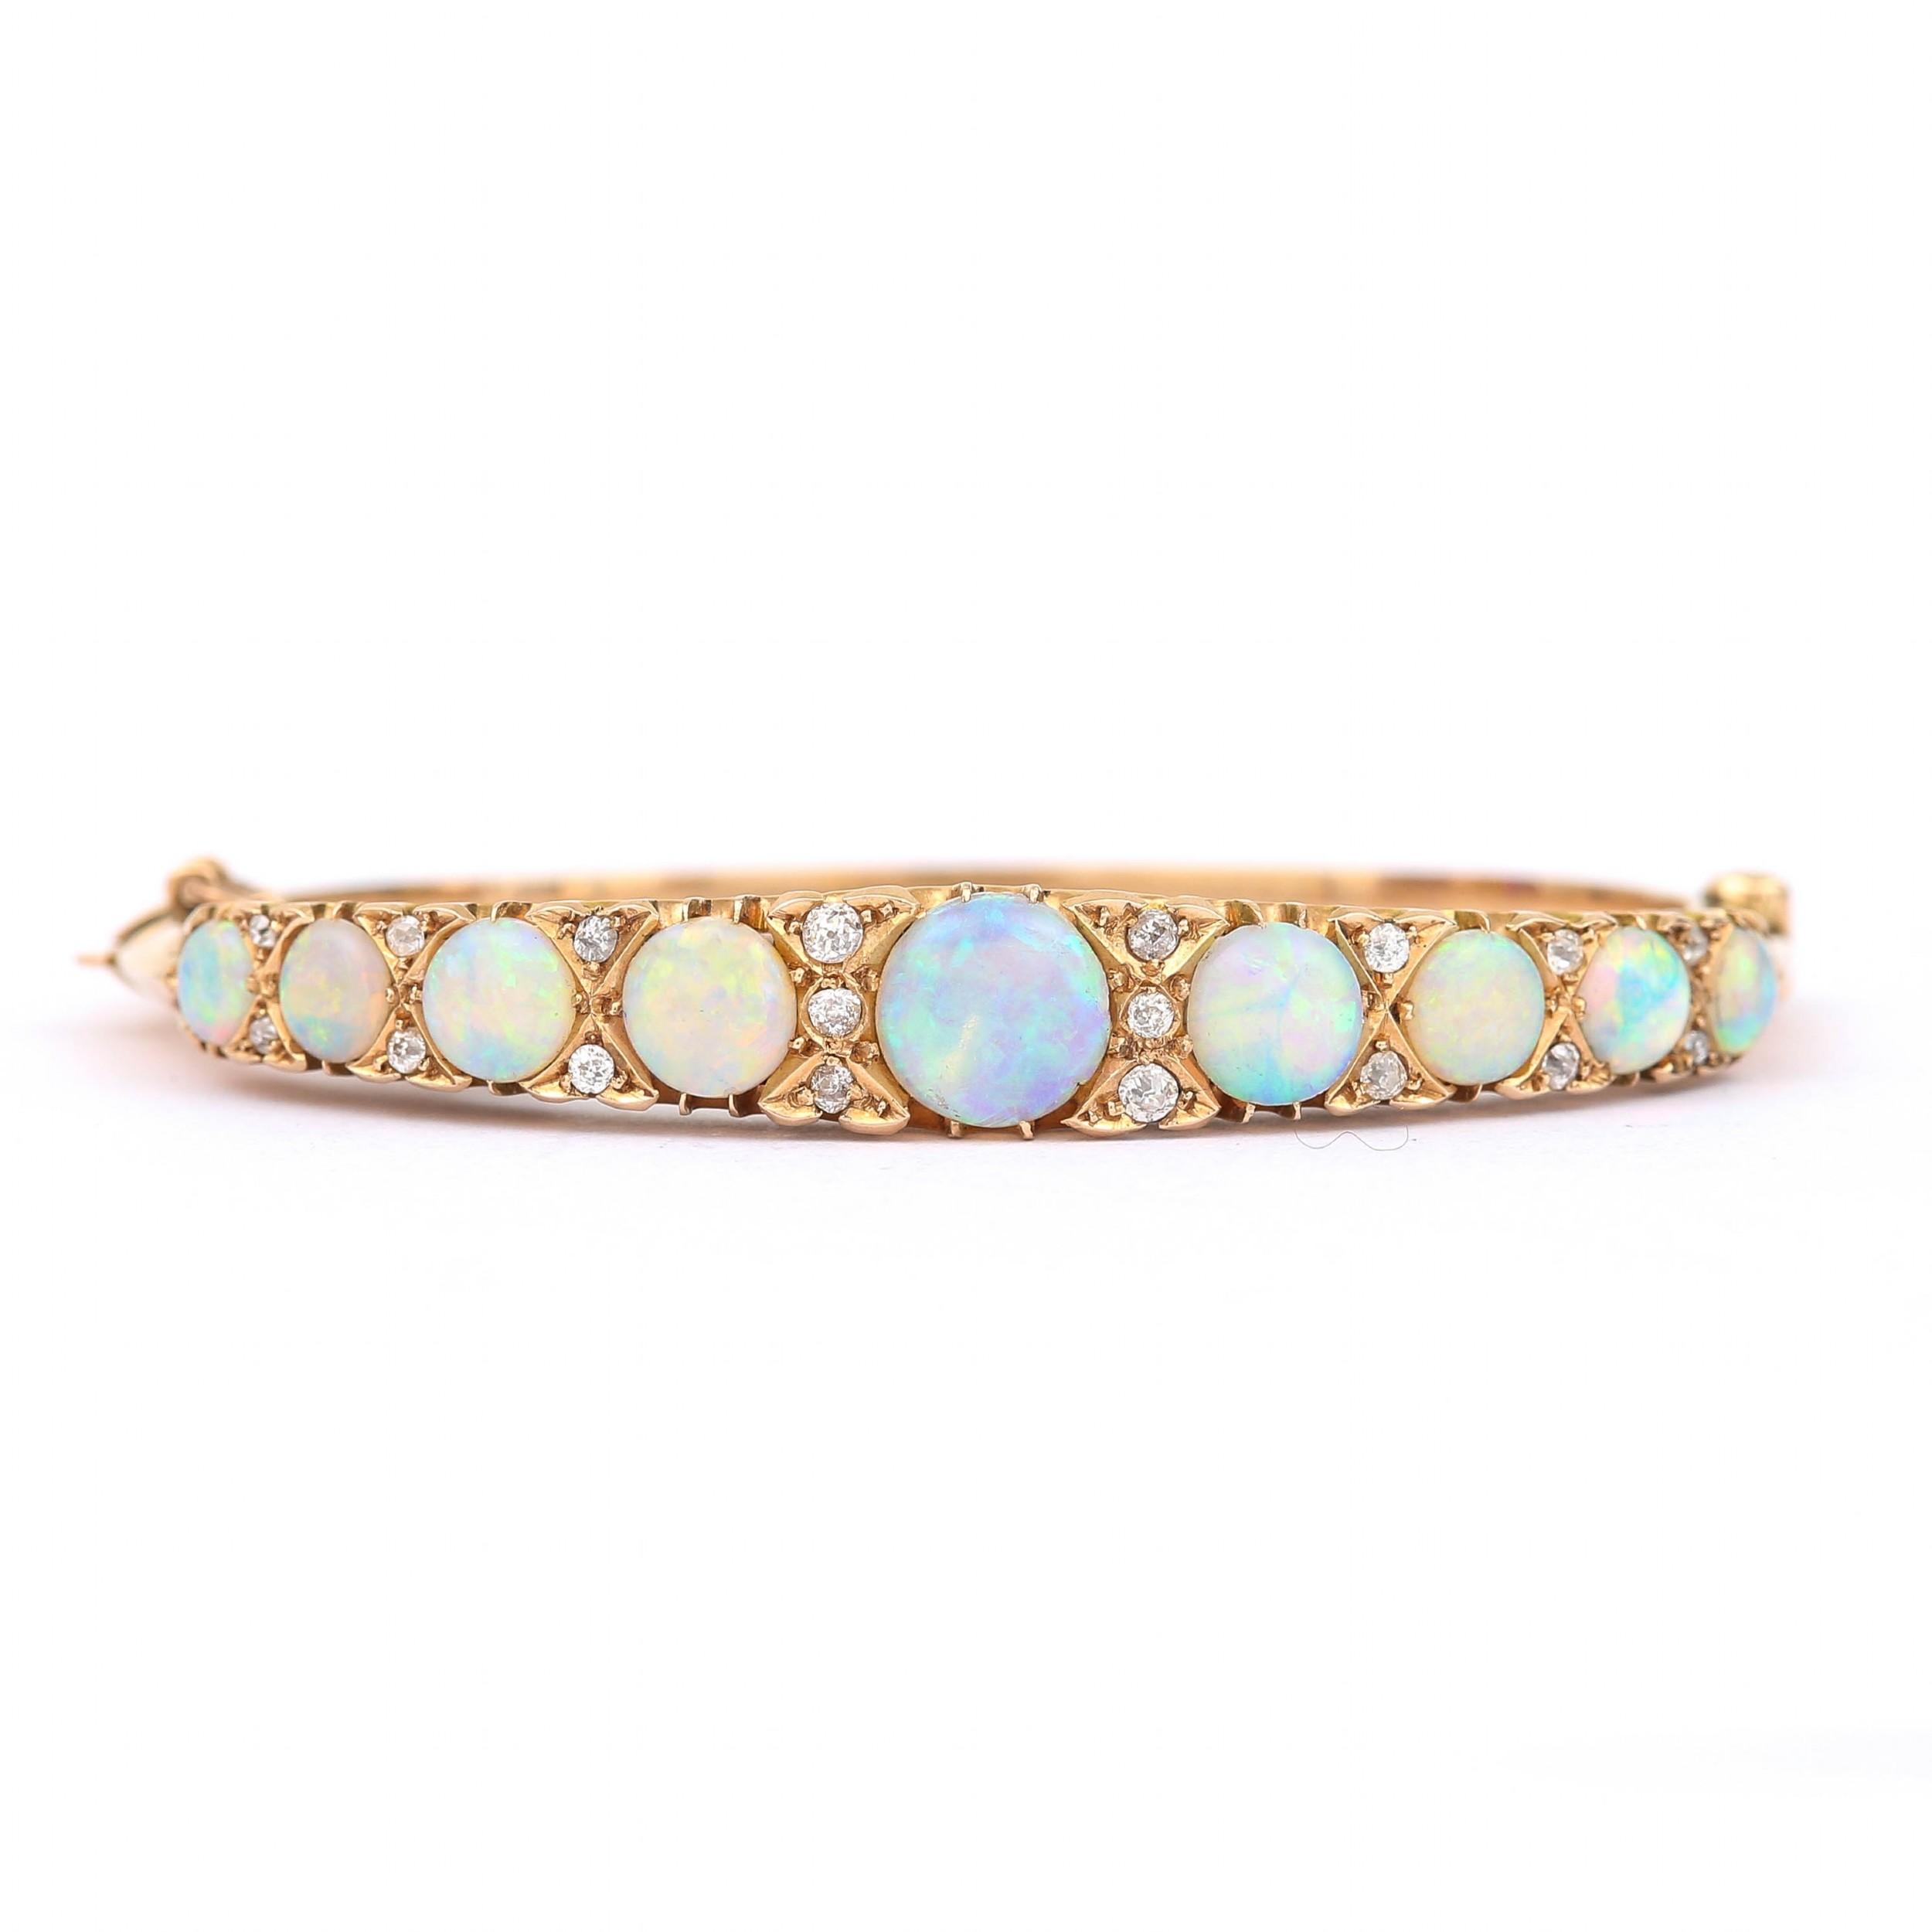 antique victorian antique opal and diamond bangle bracelet 18 karat yellow gold